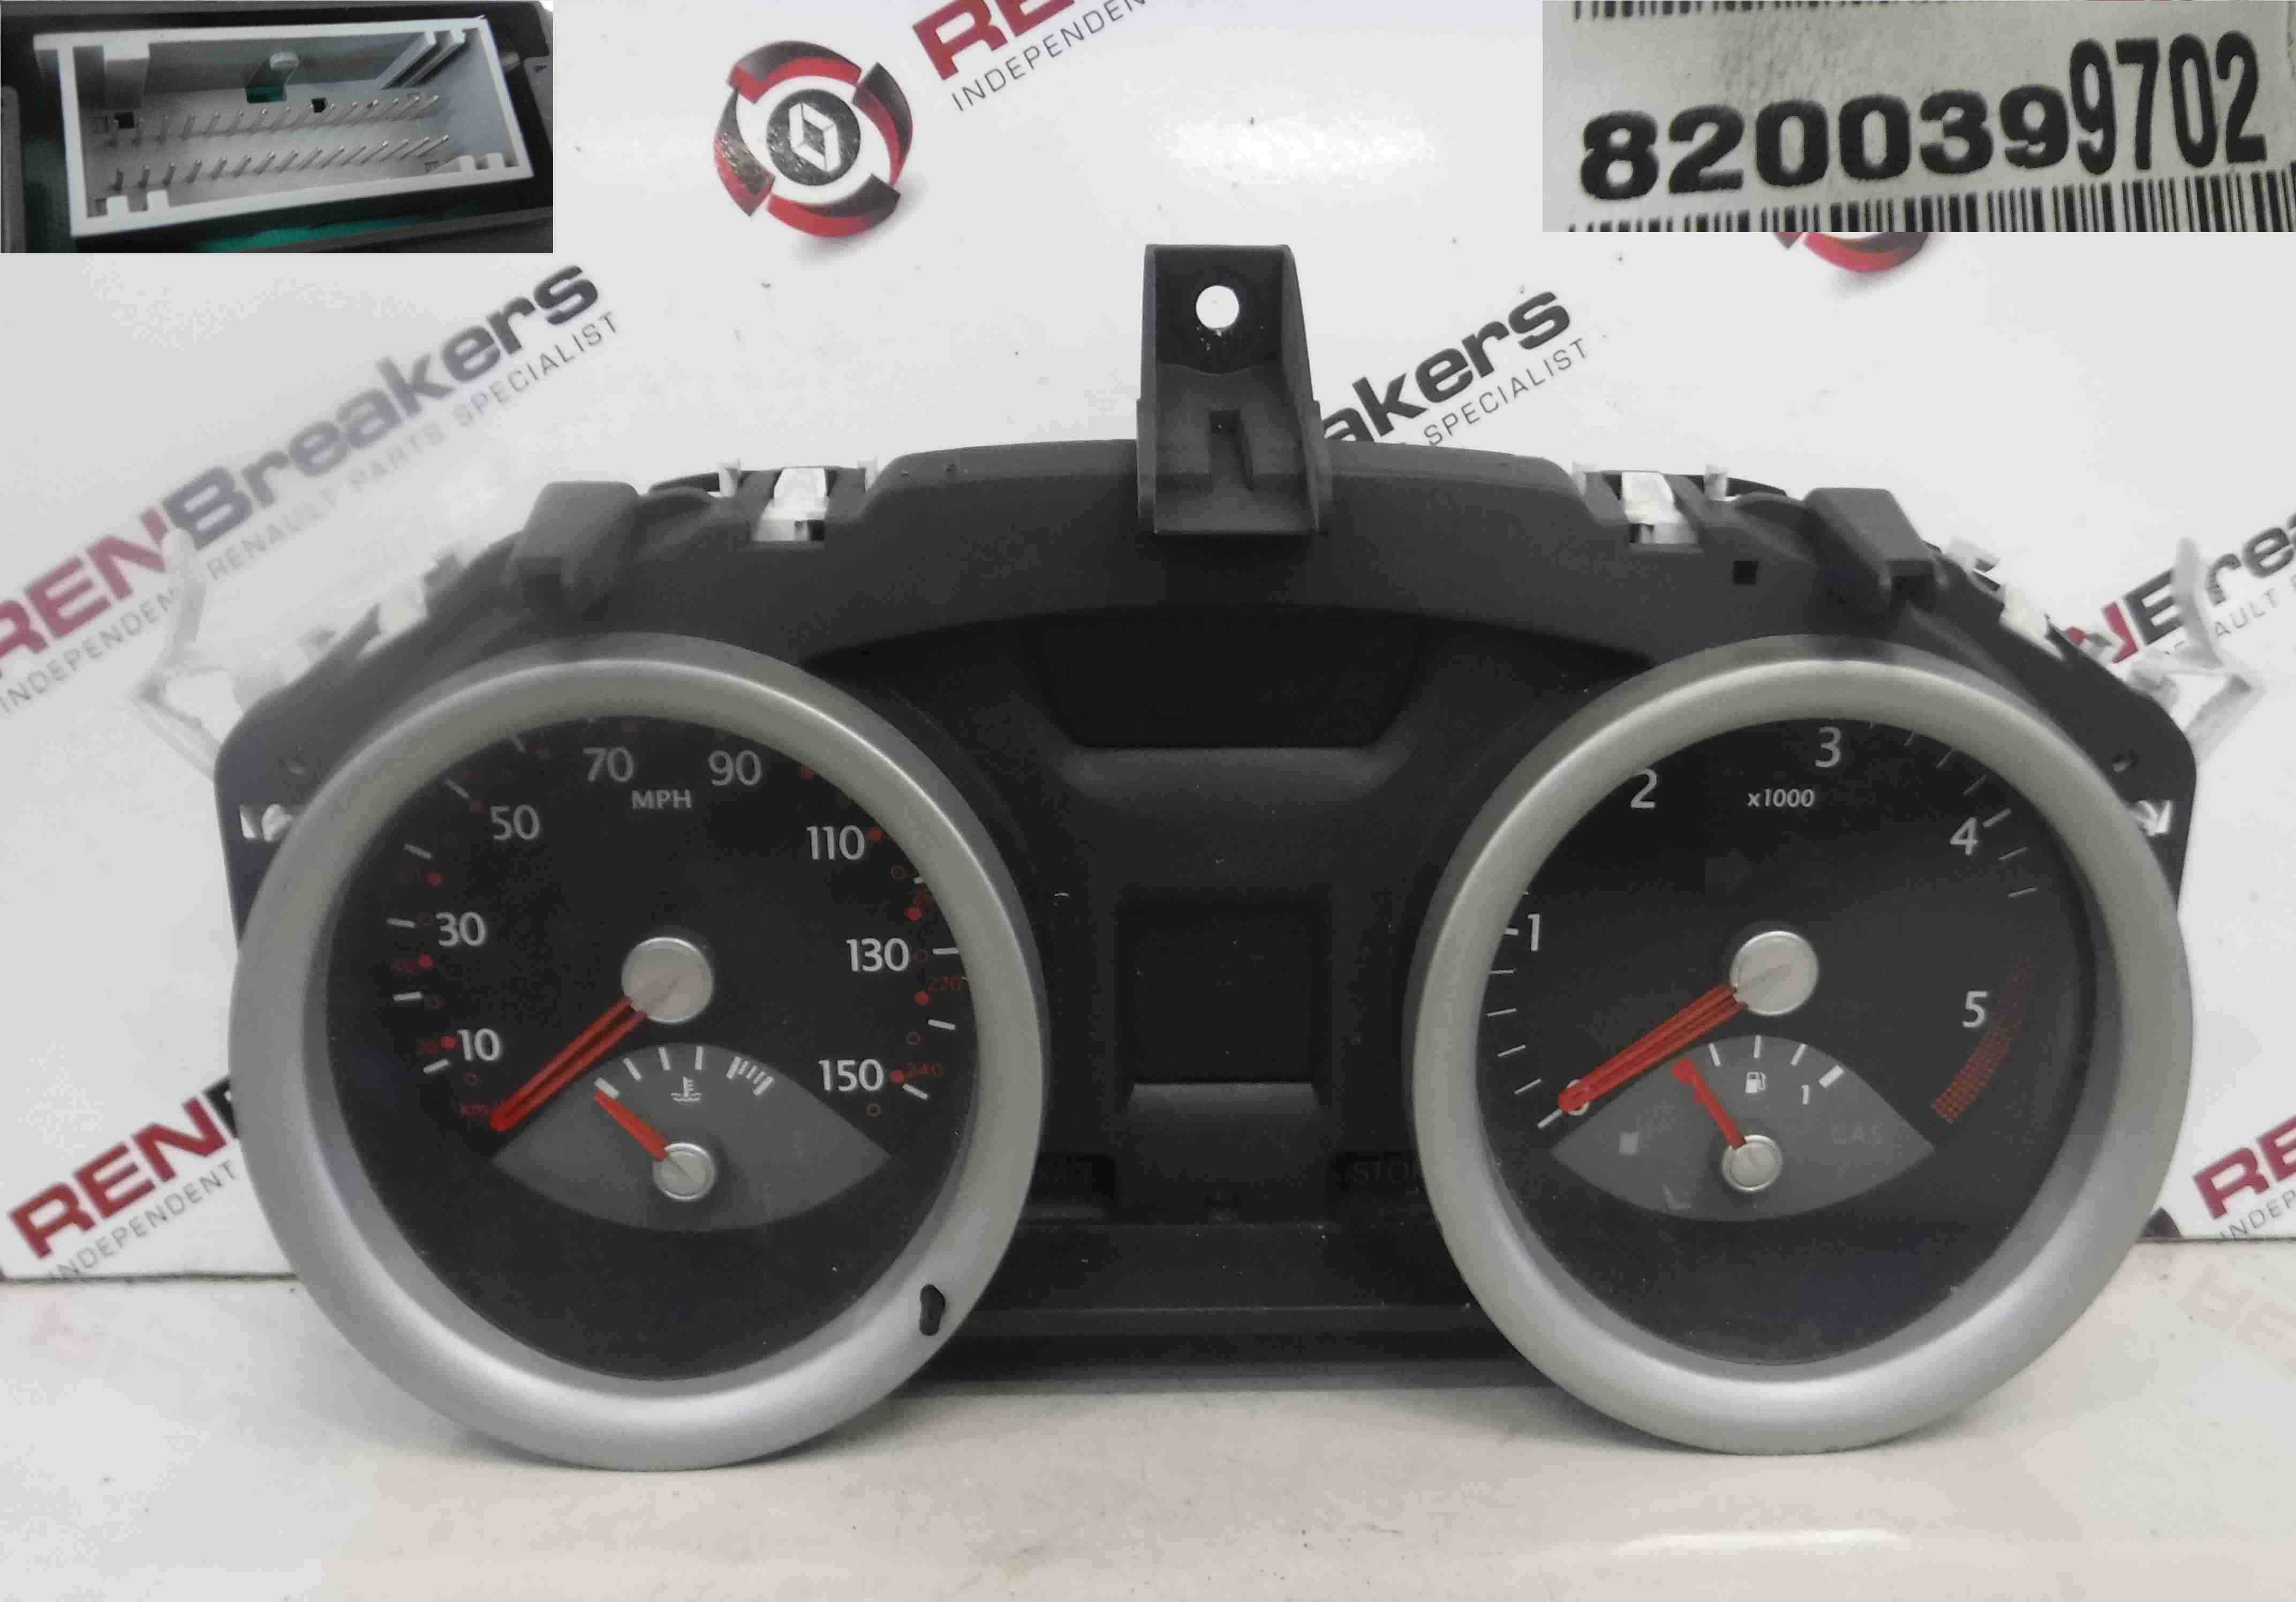 Renault Megane 2002-2008 Instrument Panel Clocks Speedo 129K 8200399702